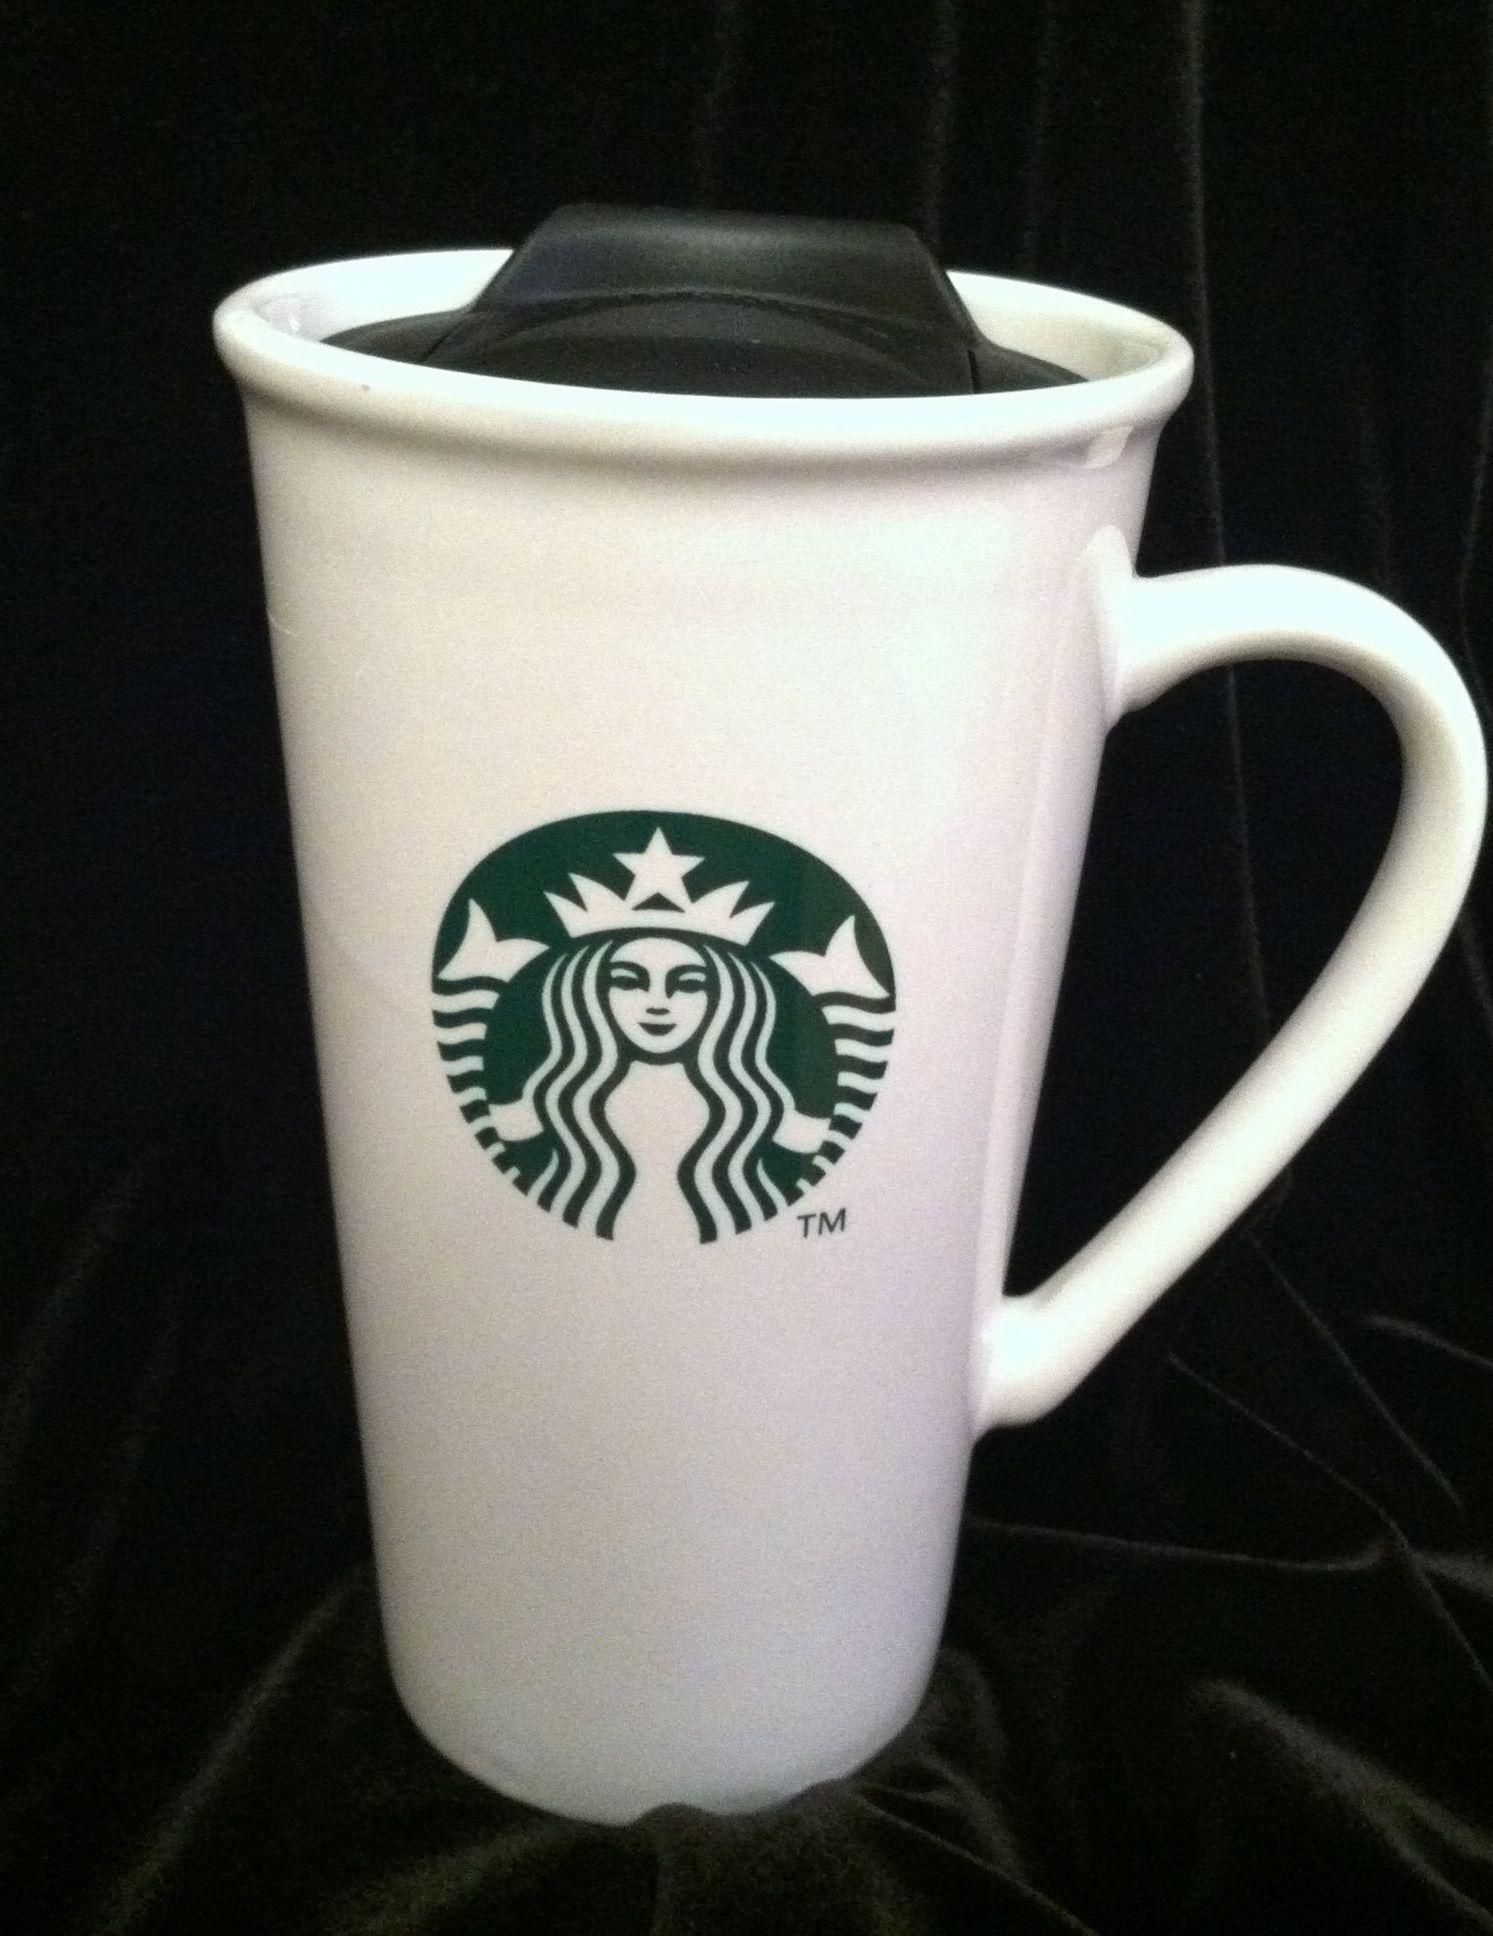 B Calm Starbucks travel mug |...